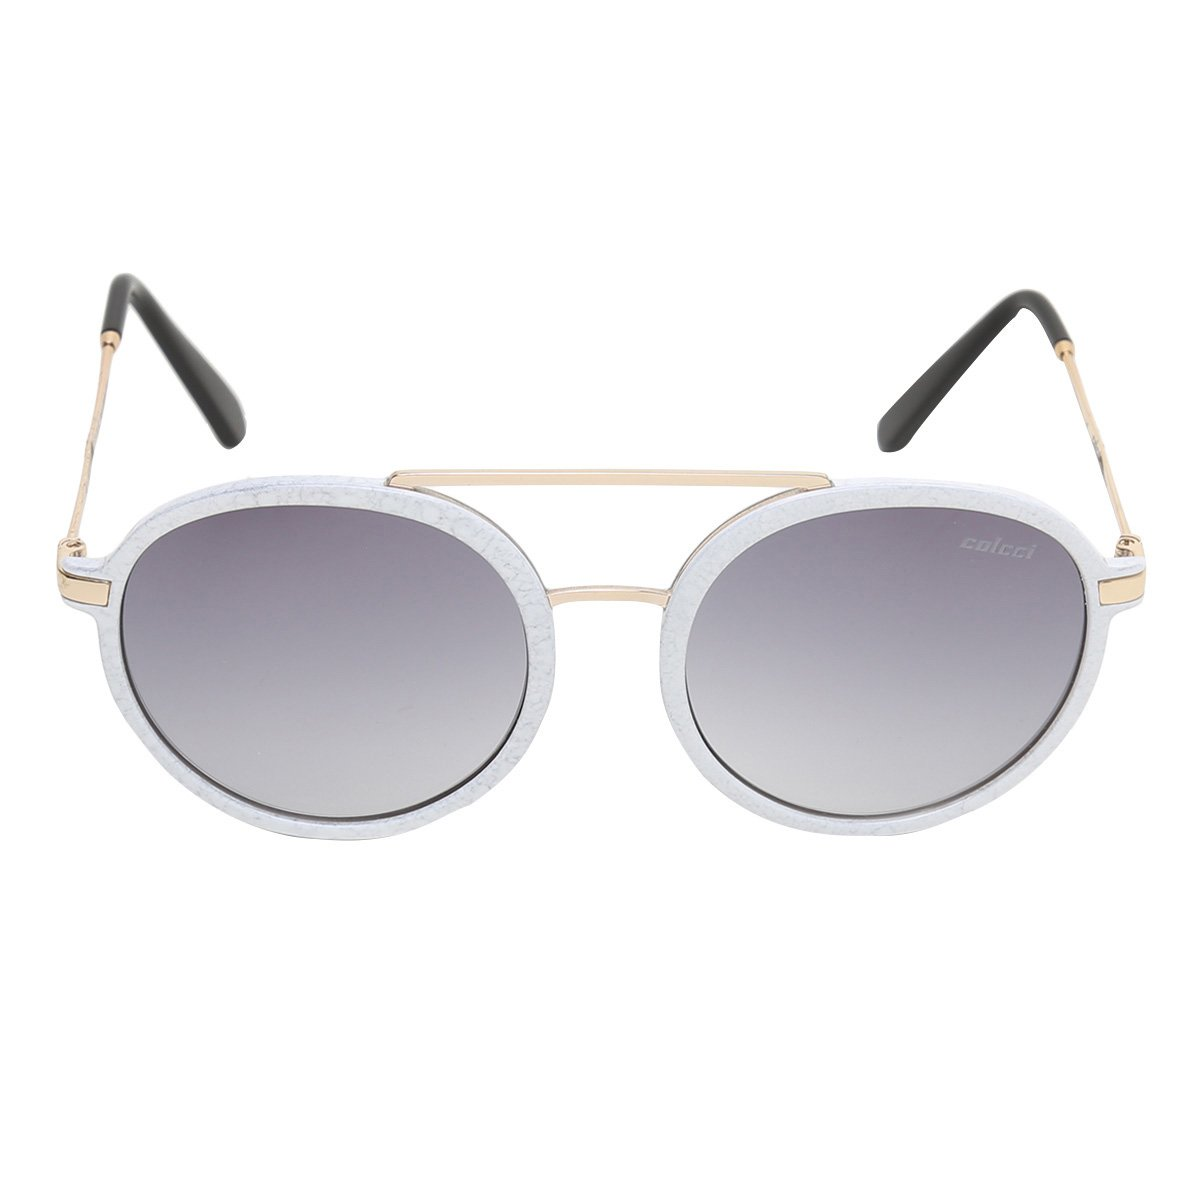 Óculos de Sol Colcci Cindy C0096B5033 Feminino - Compre Agora   Zattini fe83f69044